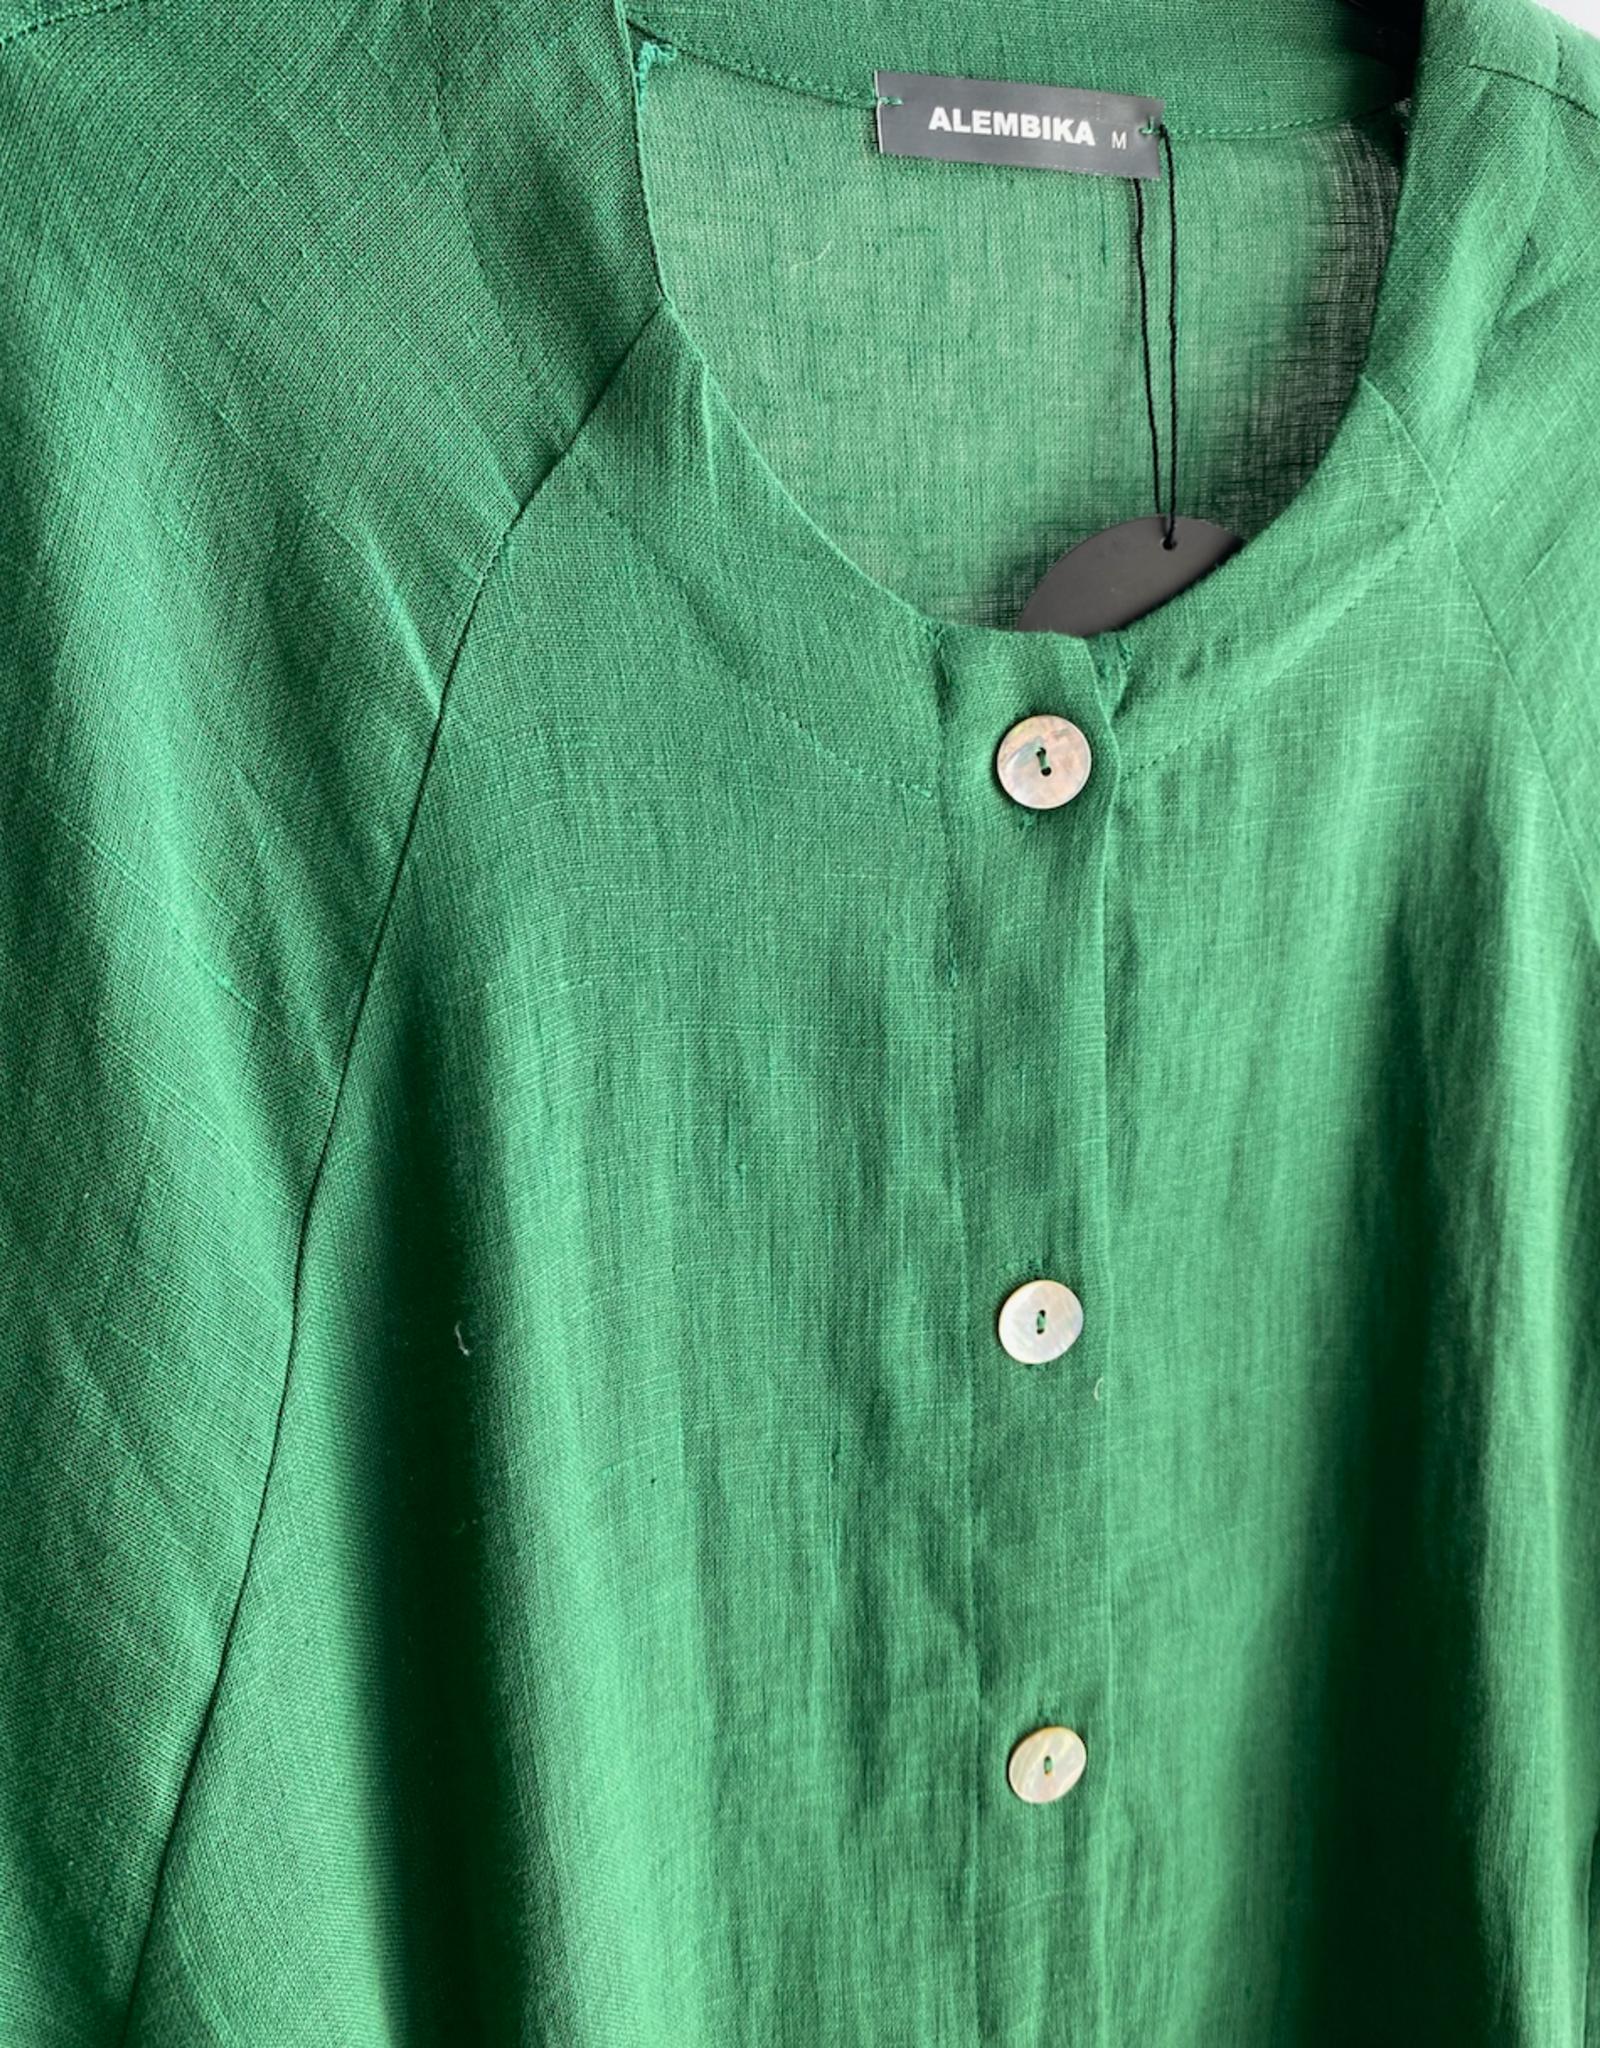 Alembika Green Jacket